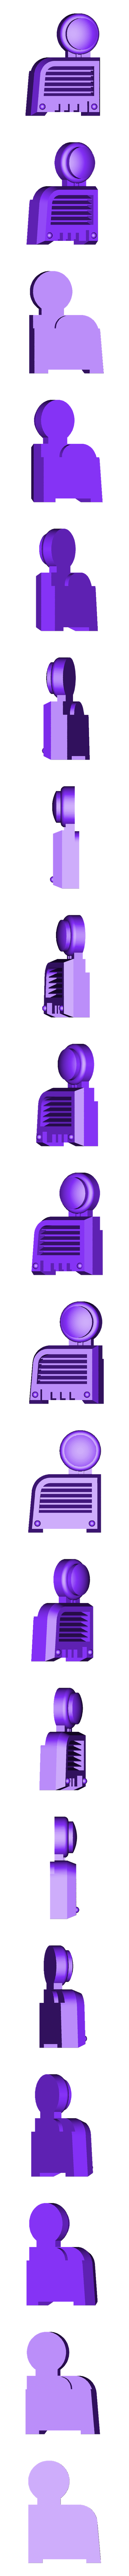 Leviathan_dreadnought_d%C3%A9coration_%C3%A9paule_arme_v2.STL Download free STL file Gros robot des anciens marin de l'espace • Template to 3D print, ologhzul